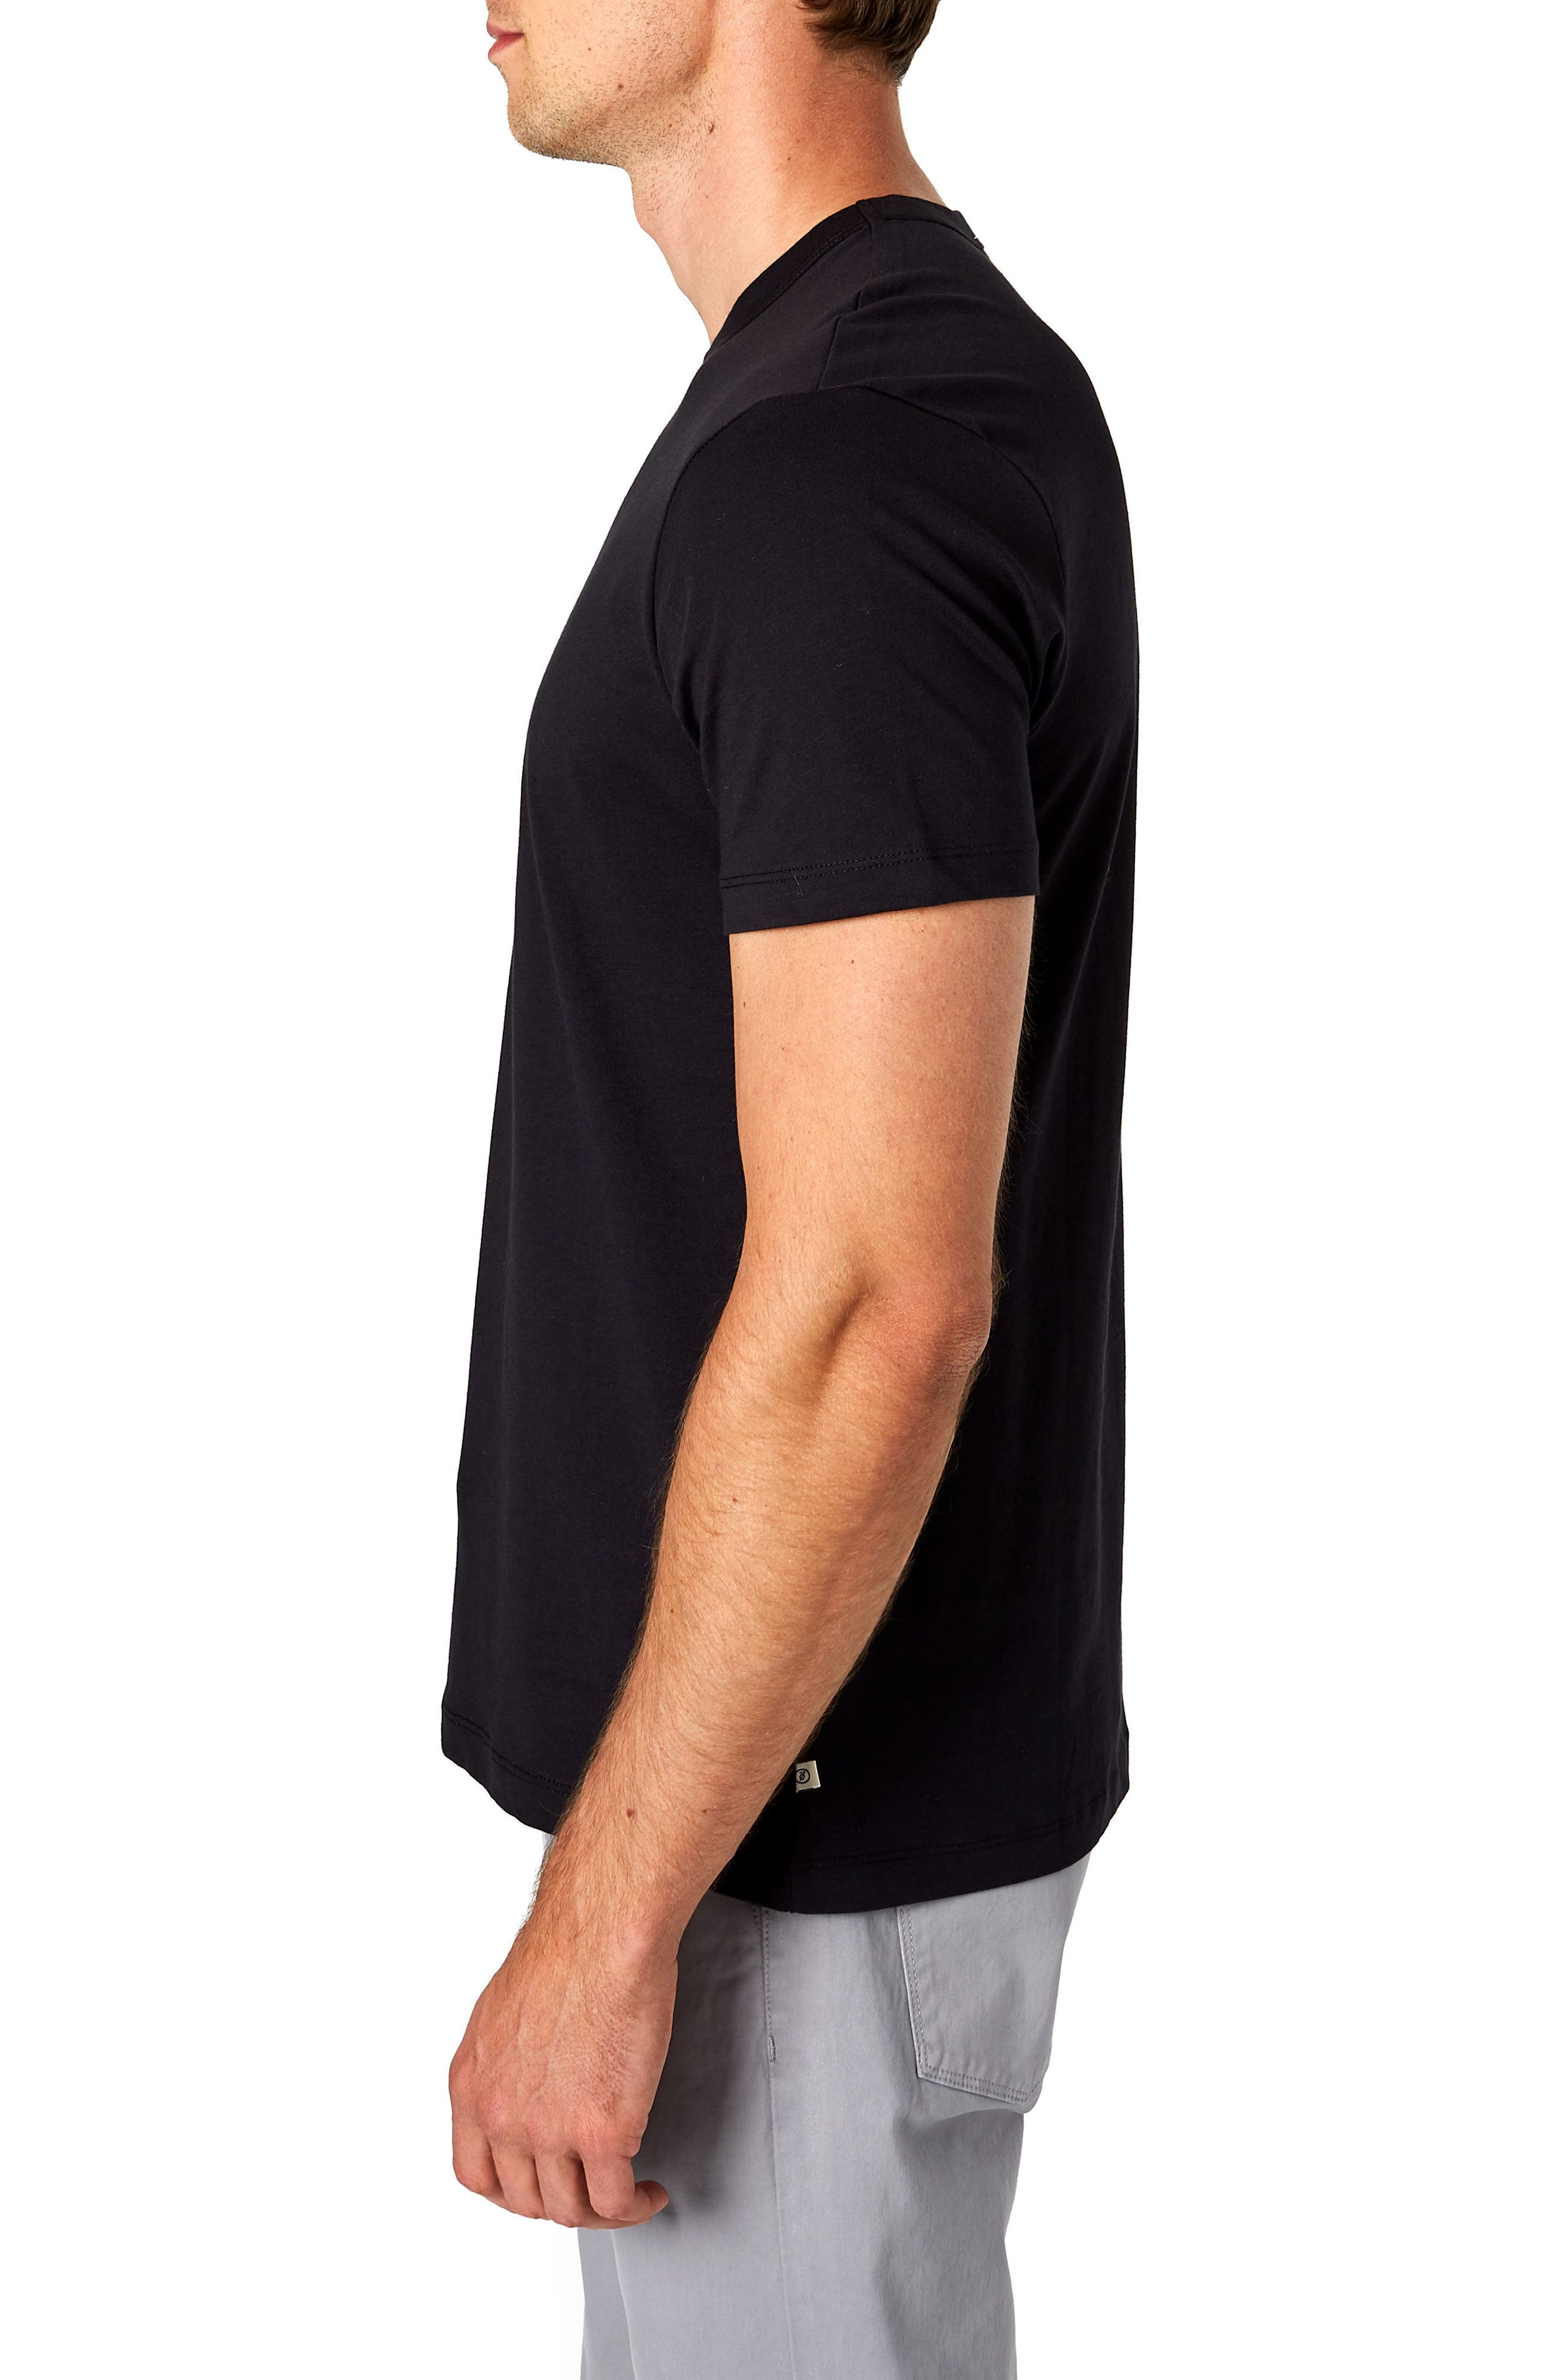 Iqonicq Crewneck T-Shirt,                             Alternate thumbnail 3, color,                             BLACK